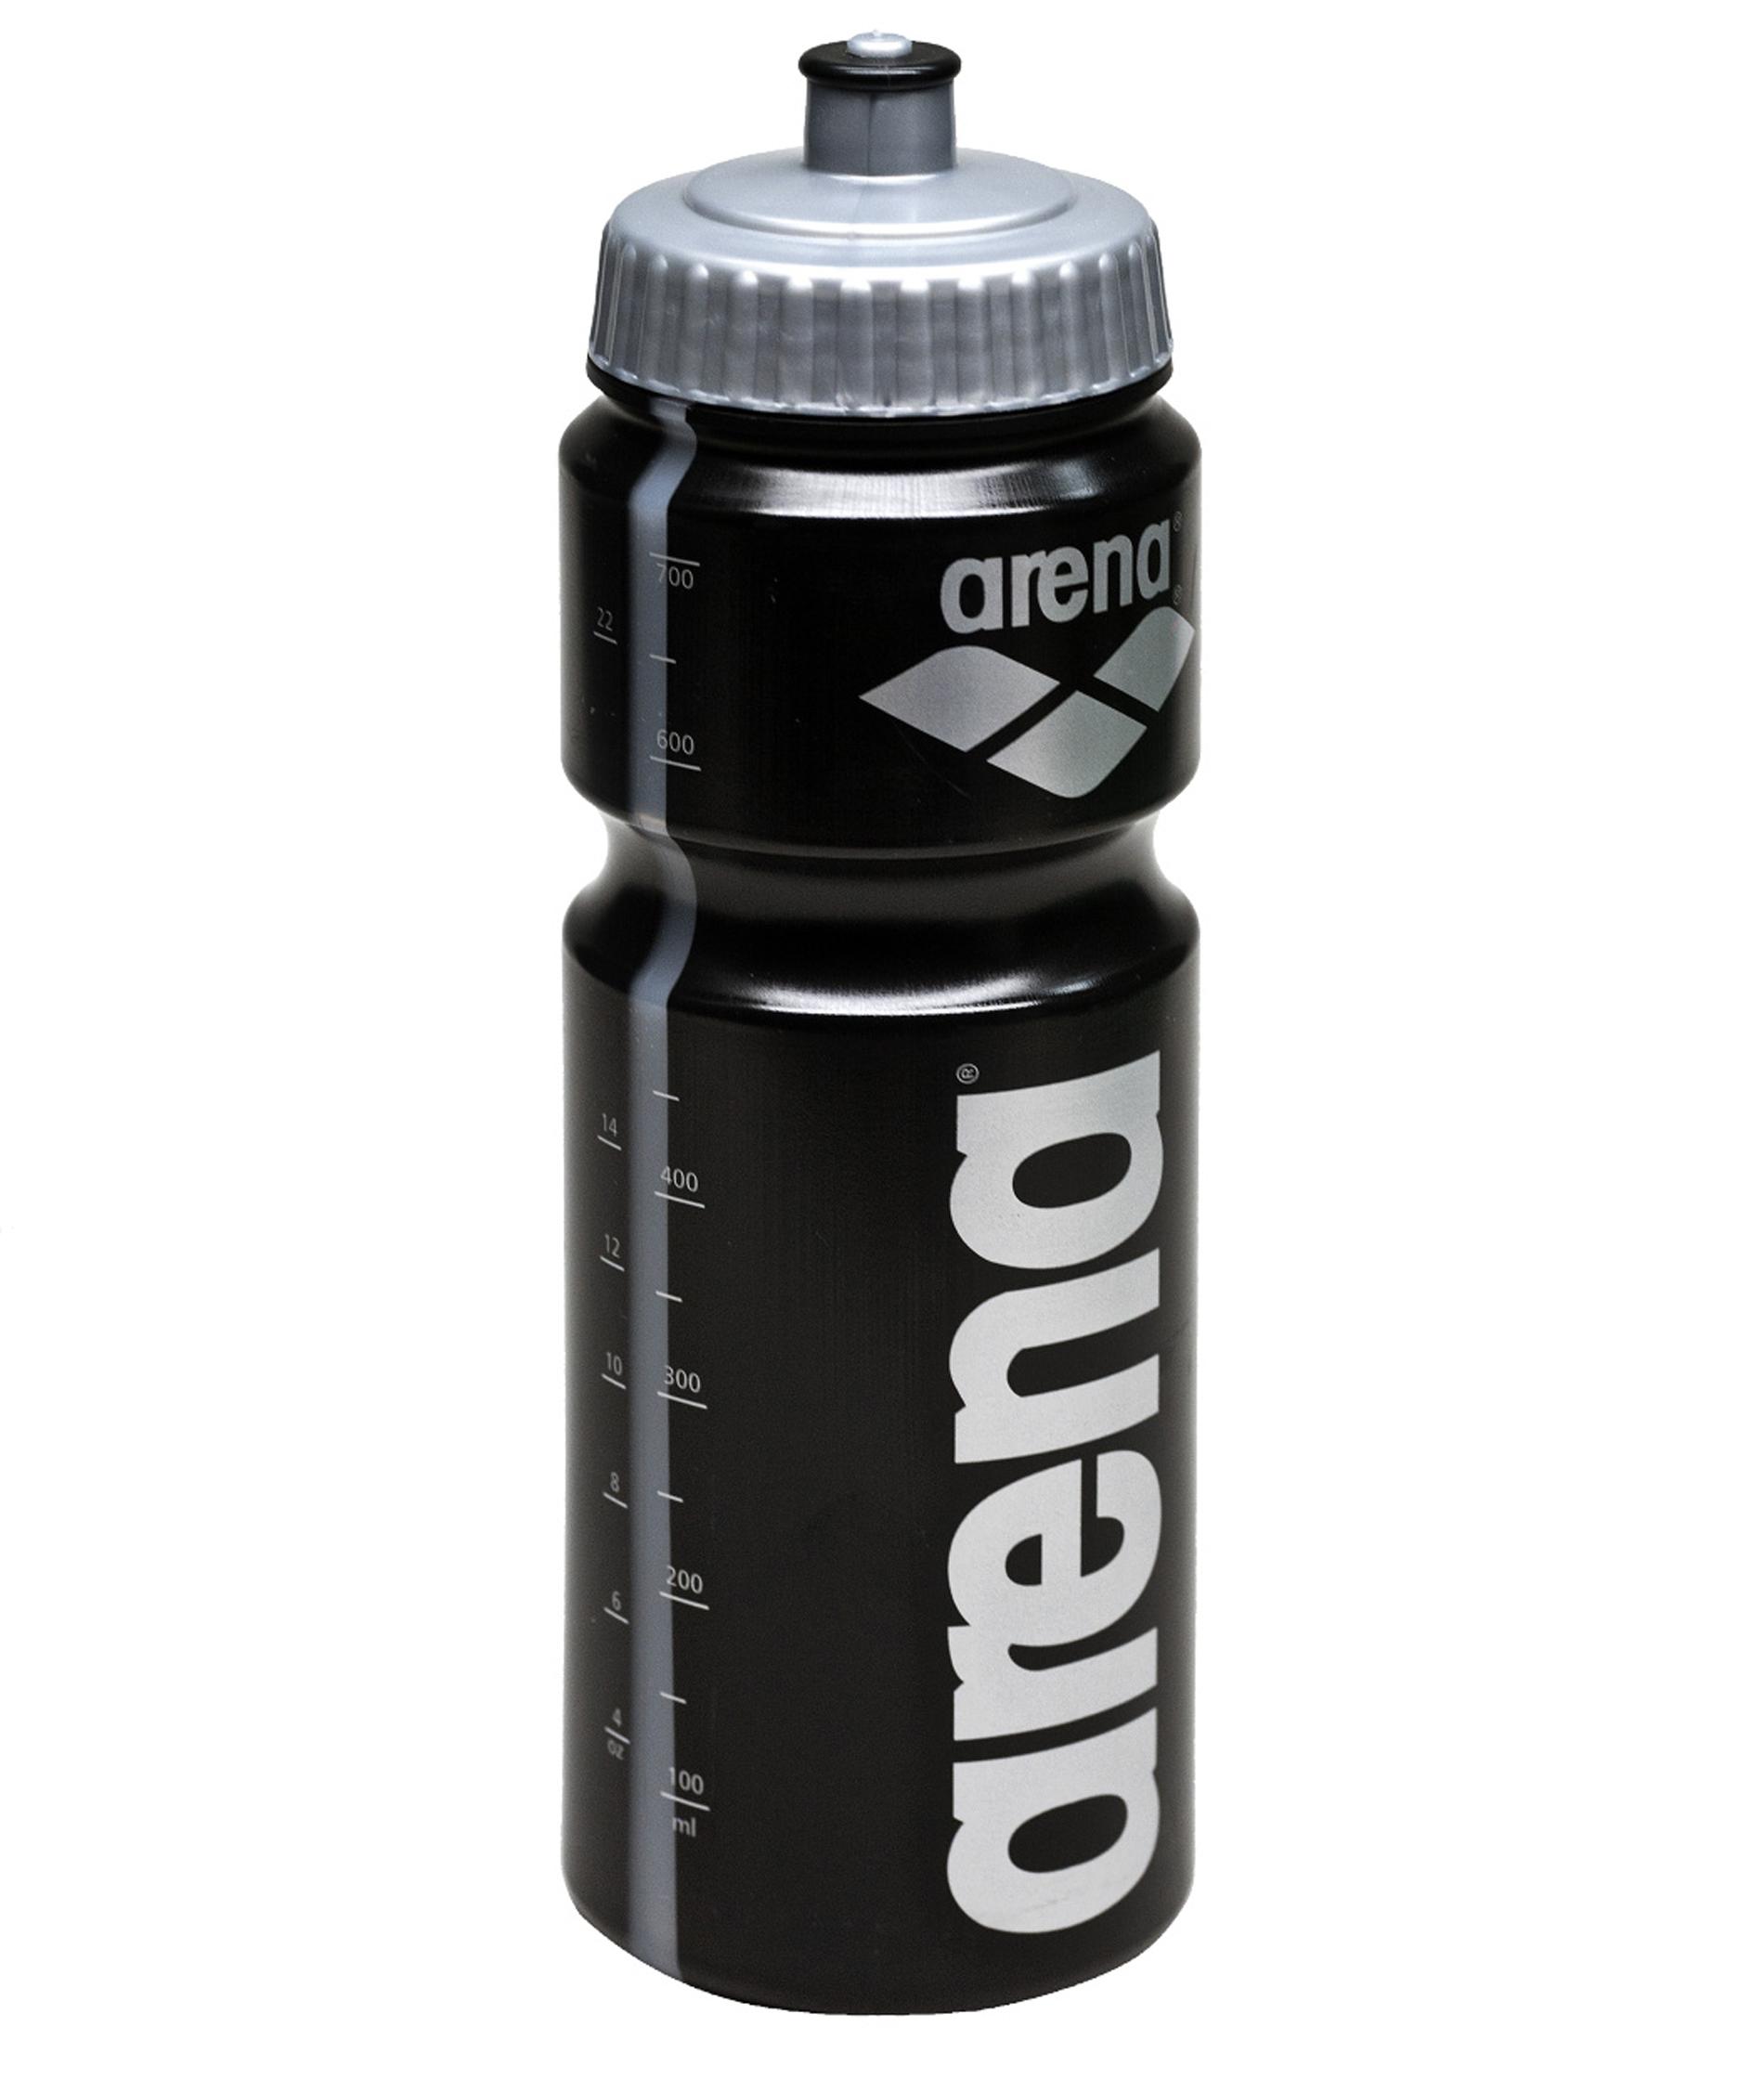 Arena 750ml Water Bottle - Black/Silver